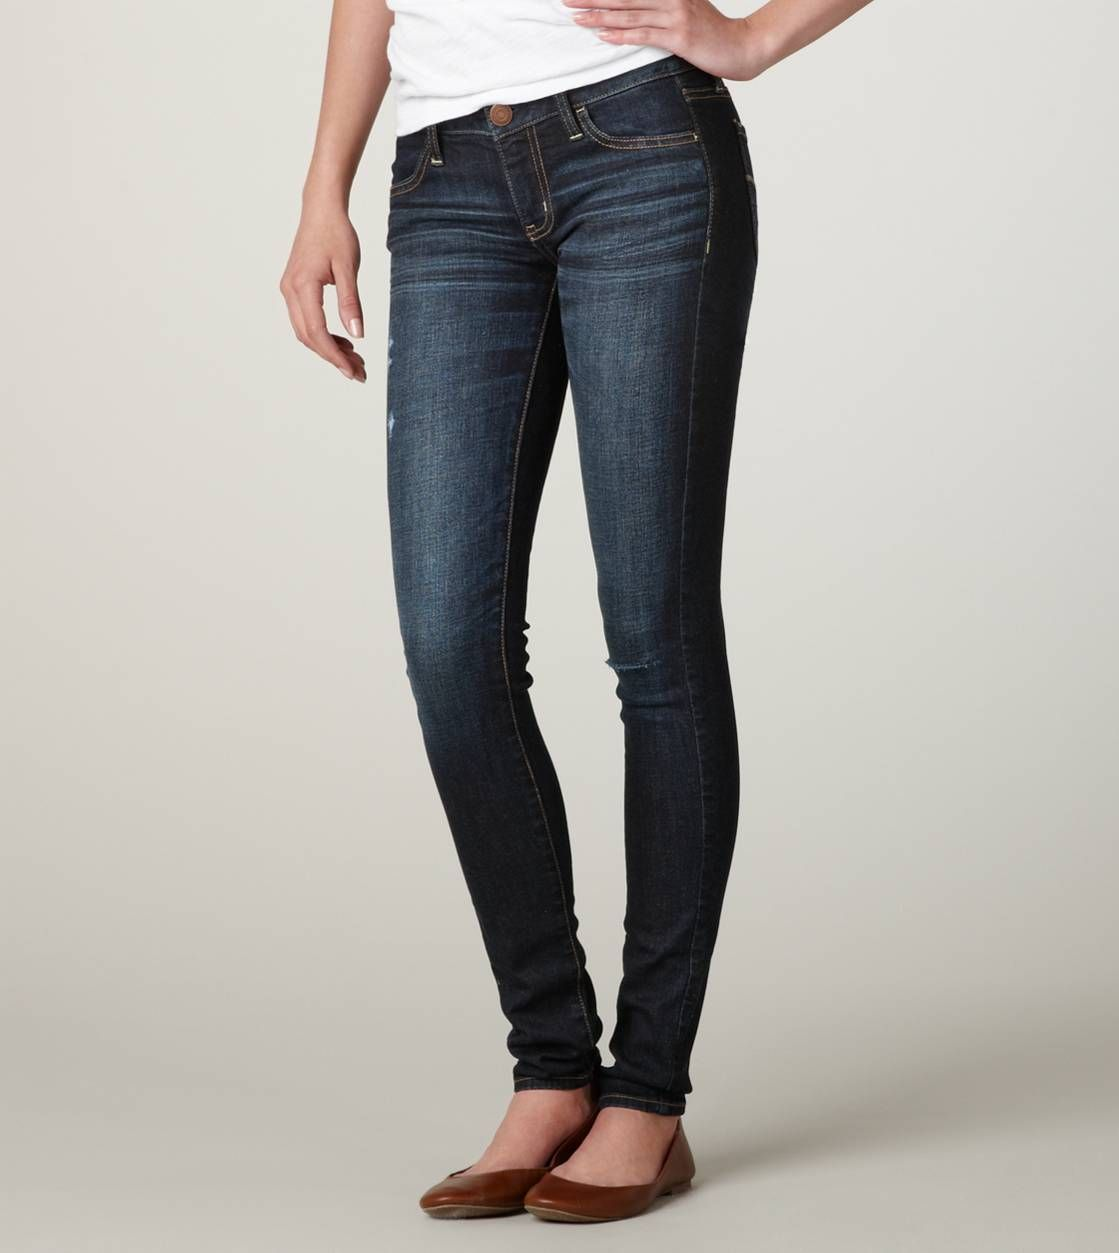 AEO Denim X Cafe Hi-Rise Jegging. American Eagle JeansAmerican ... - American Eagle Skinny Jean PURE DARK INDIGO Style $39.95 Regular